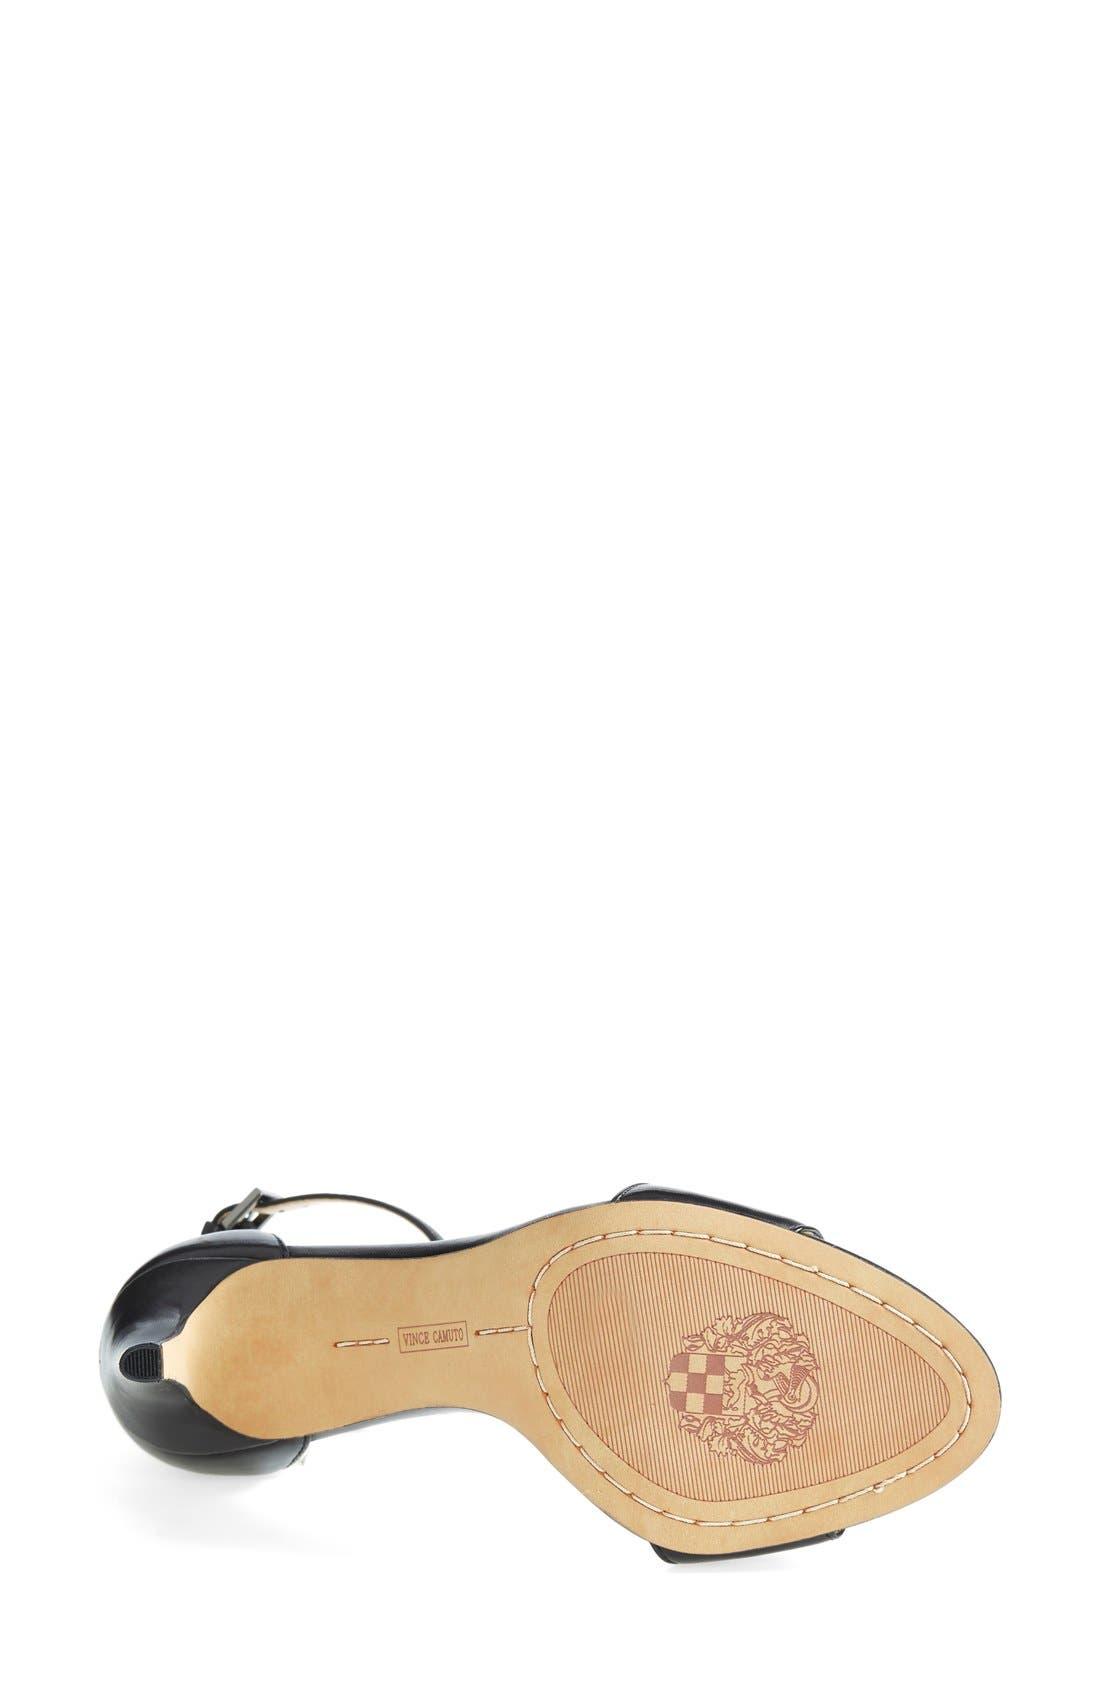 VINCE CAMUTO, 'Court' Ankle Strap Sandal, Alternate thumbnail 5, color, 001